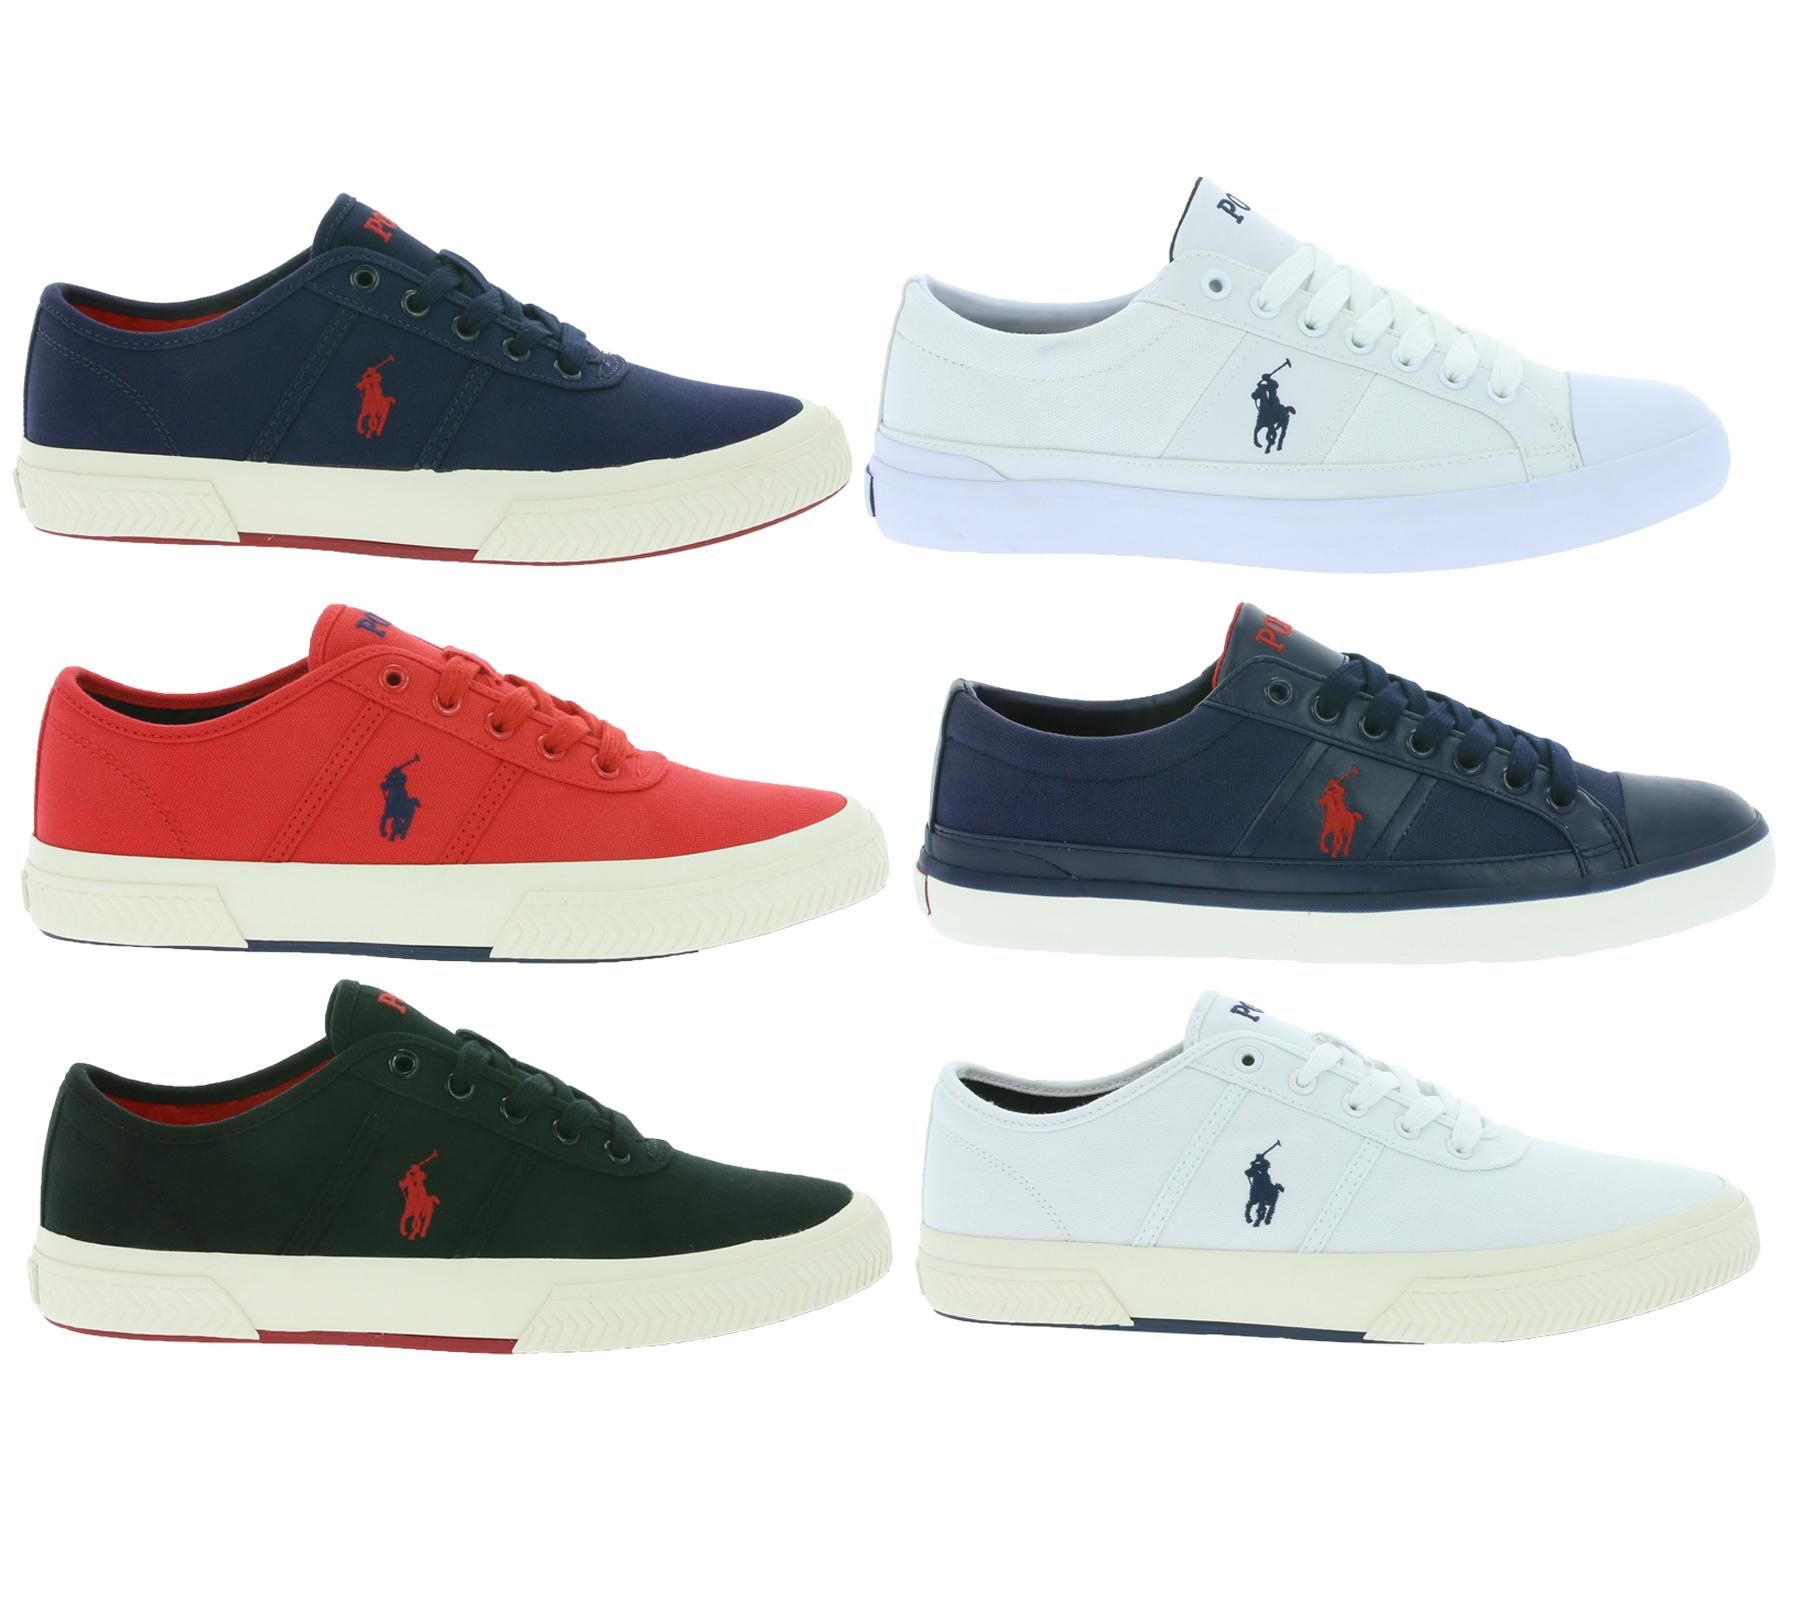 (POLO) RALPH LAUREN Herren Sneaker / Gr.40-45 / Viele Farben @Outlet46